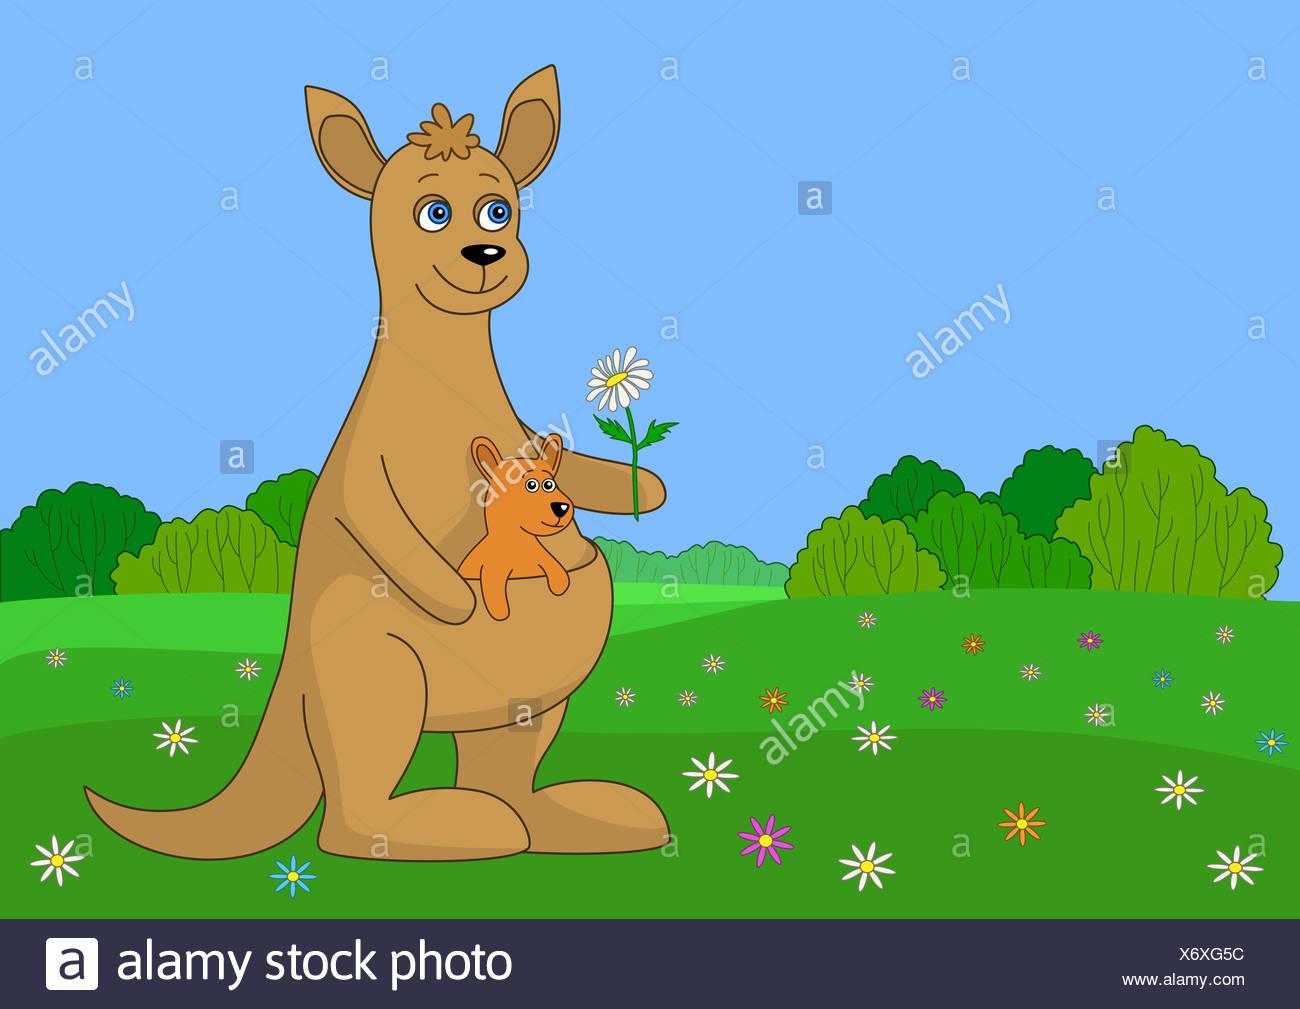 Cartoon Baby Kangaroo Stockfotos & Cartoon Baby Kangaroo Bilder - Alamy